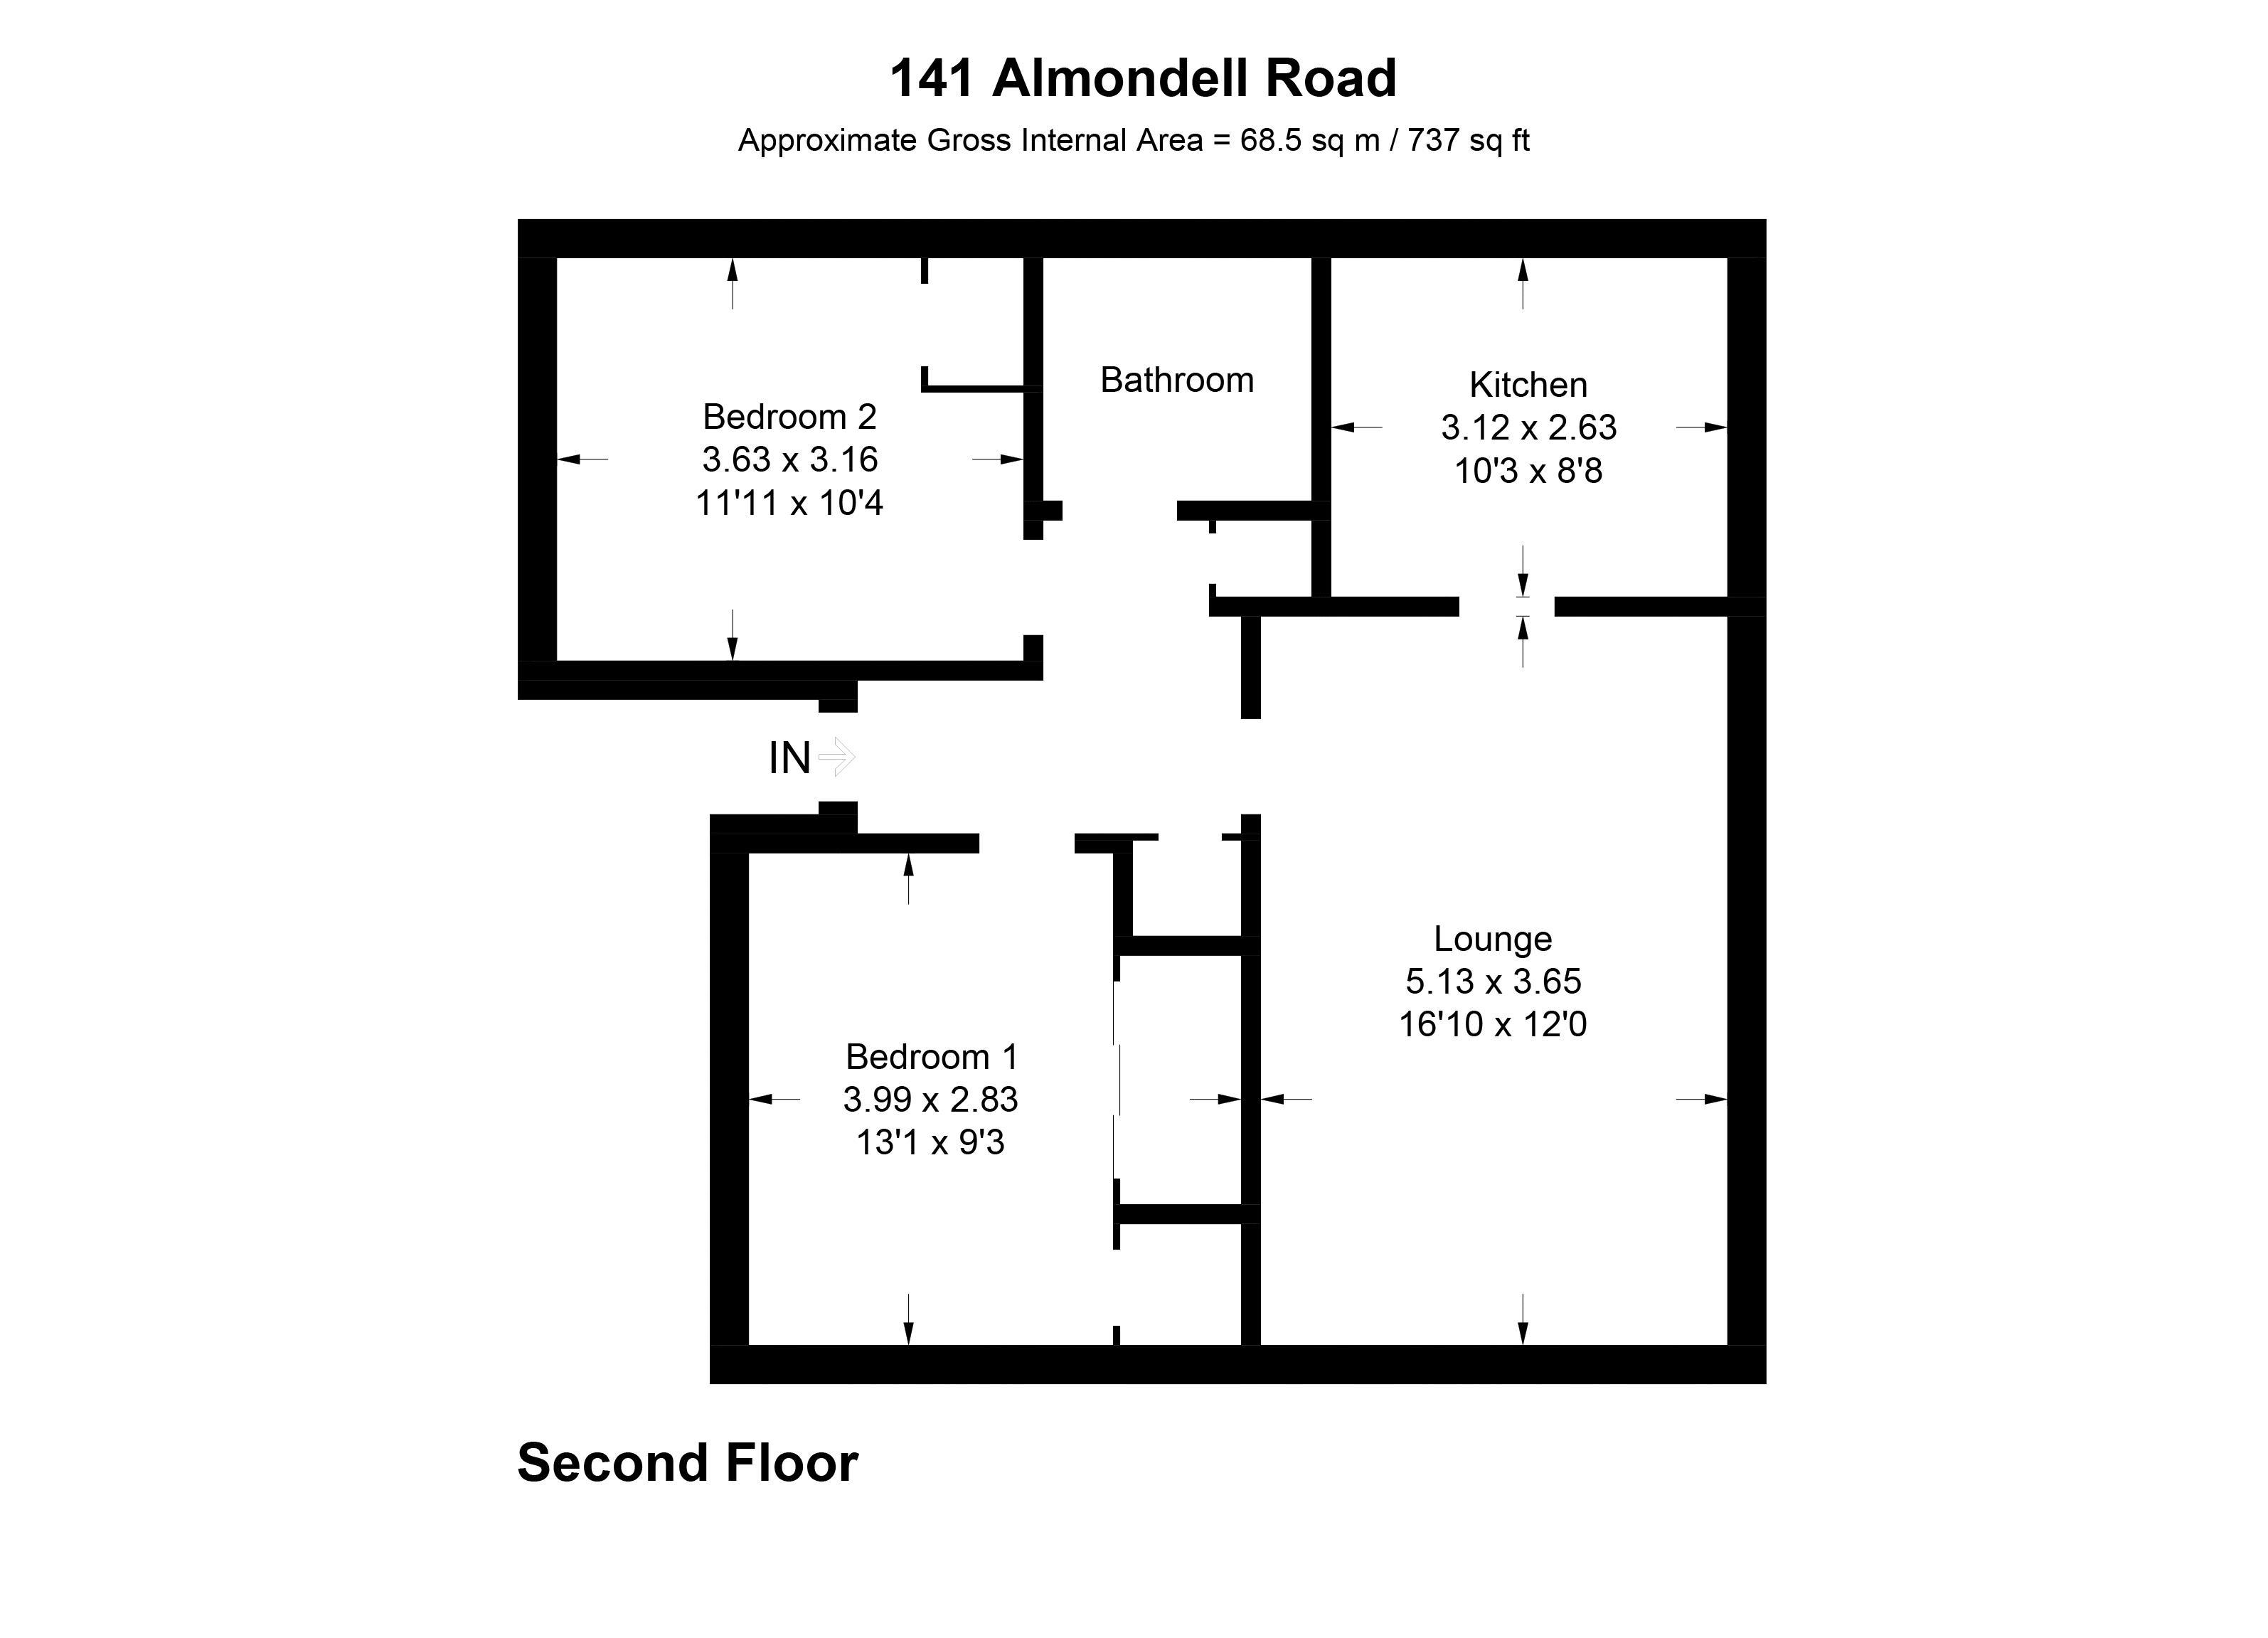 Almondell Road